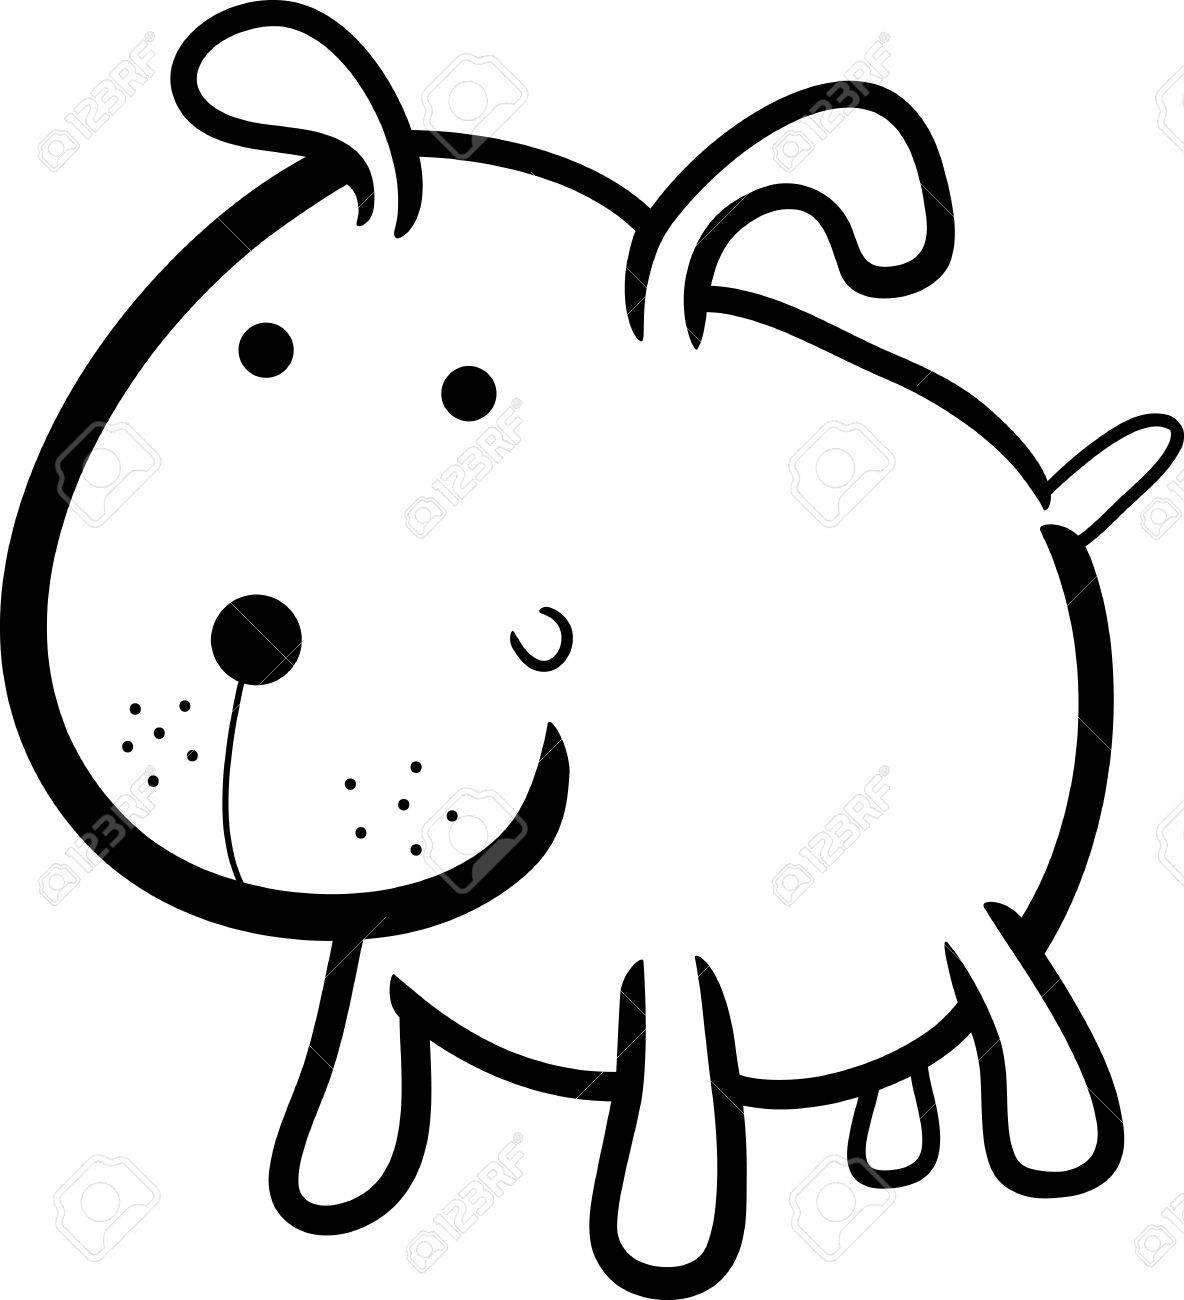 Ilustracion De Dibujos Animados De Perro O Cachorro Bonito Libro